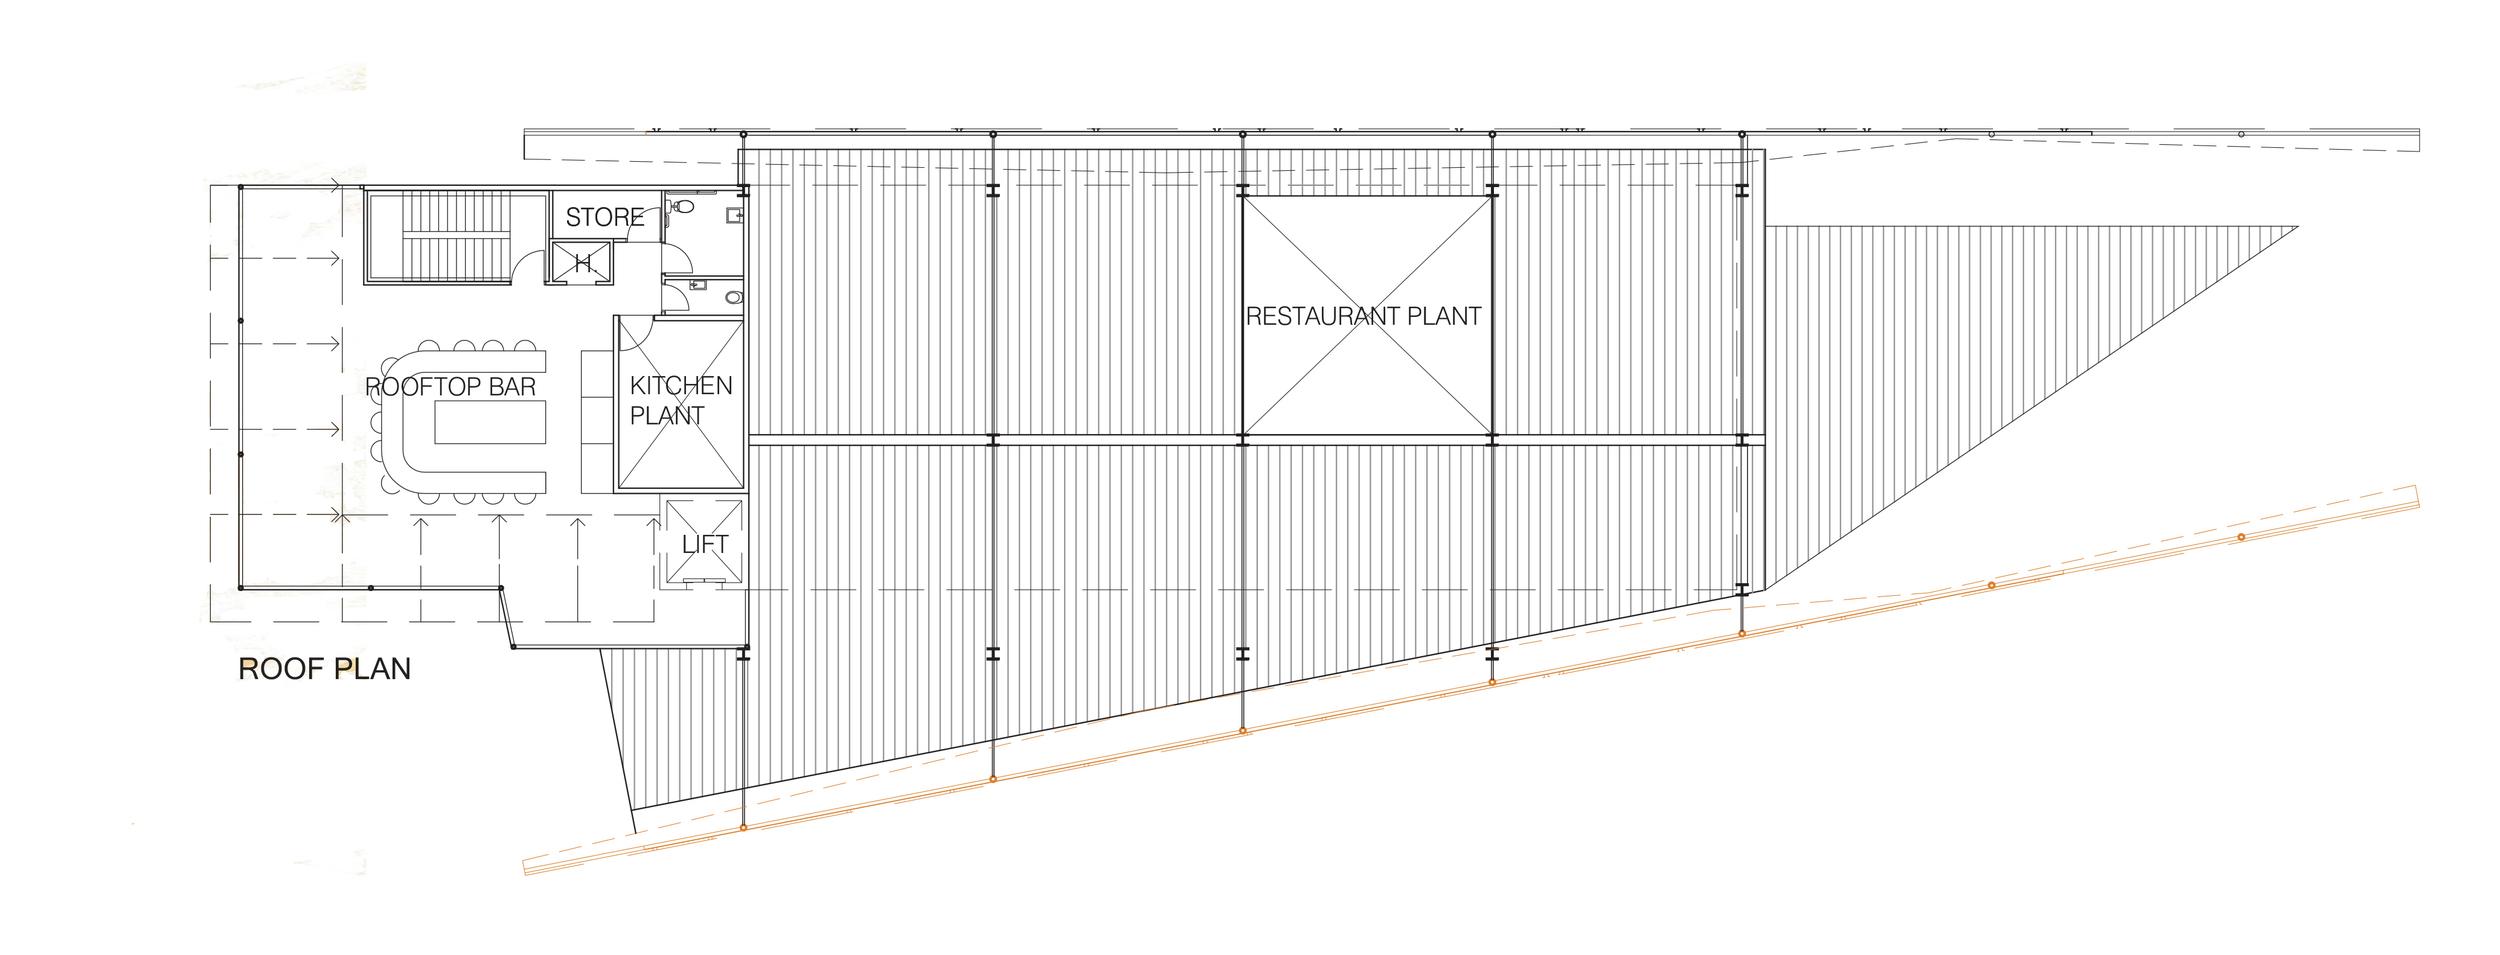 09_Susan Dugdale and Associates_darwin_signature_restaurant_roof_plan.jpg